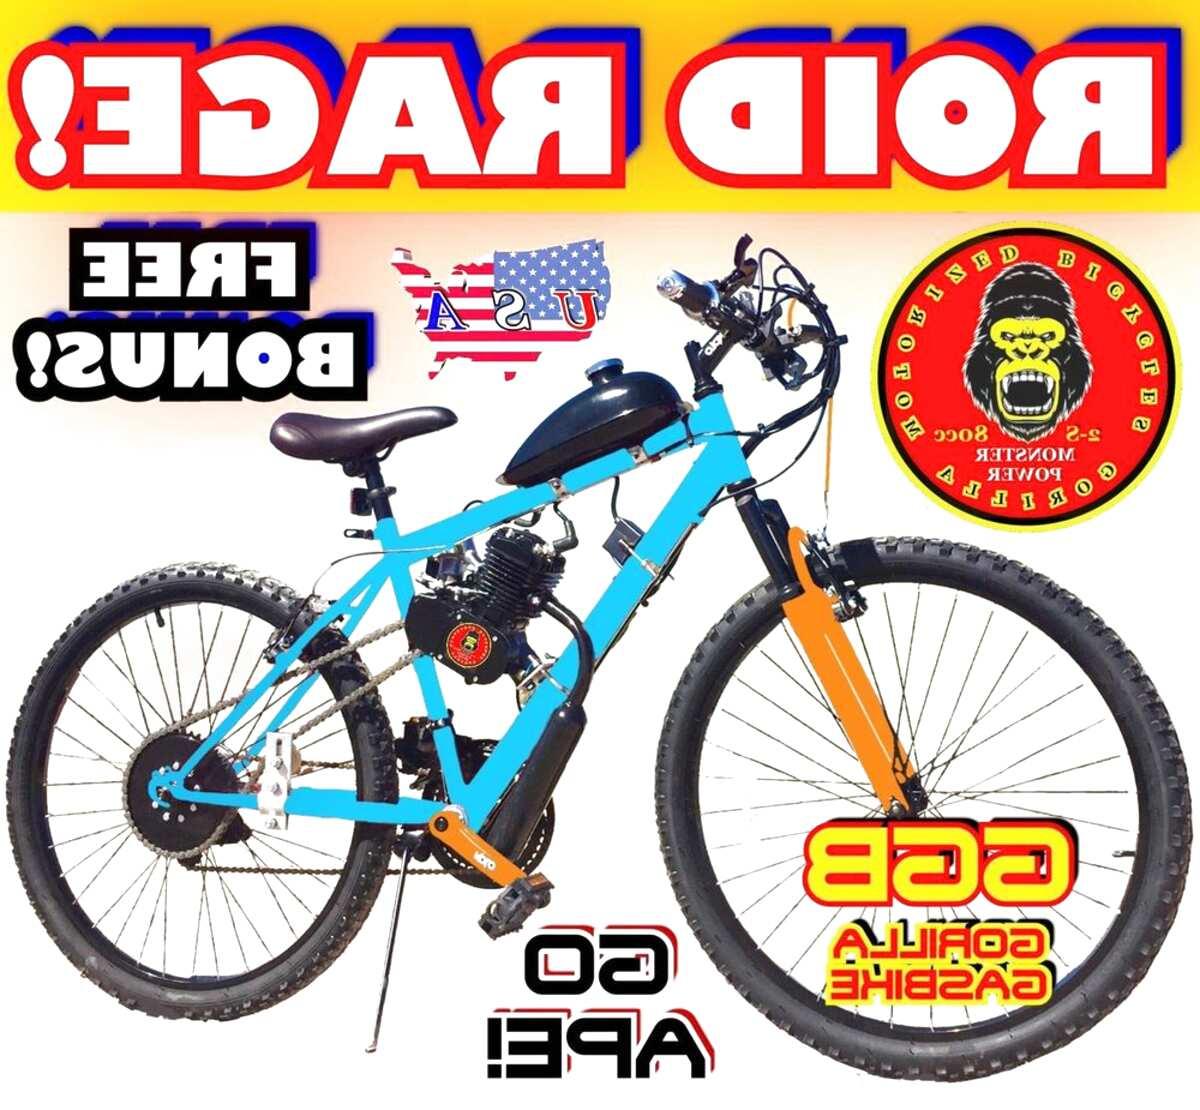 QAZAKY 415-110L Chain 49cc 50cc 60cc 66cc 80cc 2-Stroke Engines Motor Motorized Bicycle Bike 415 110L